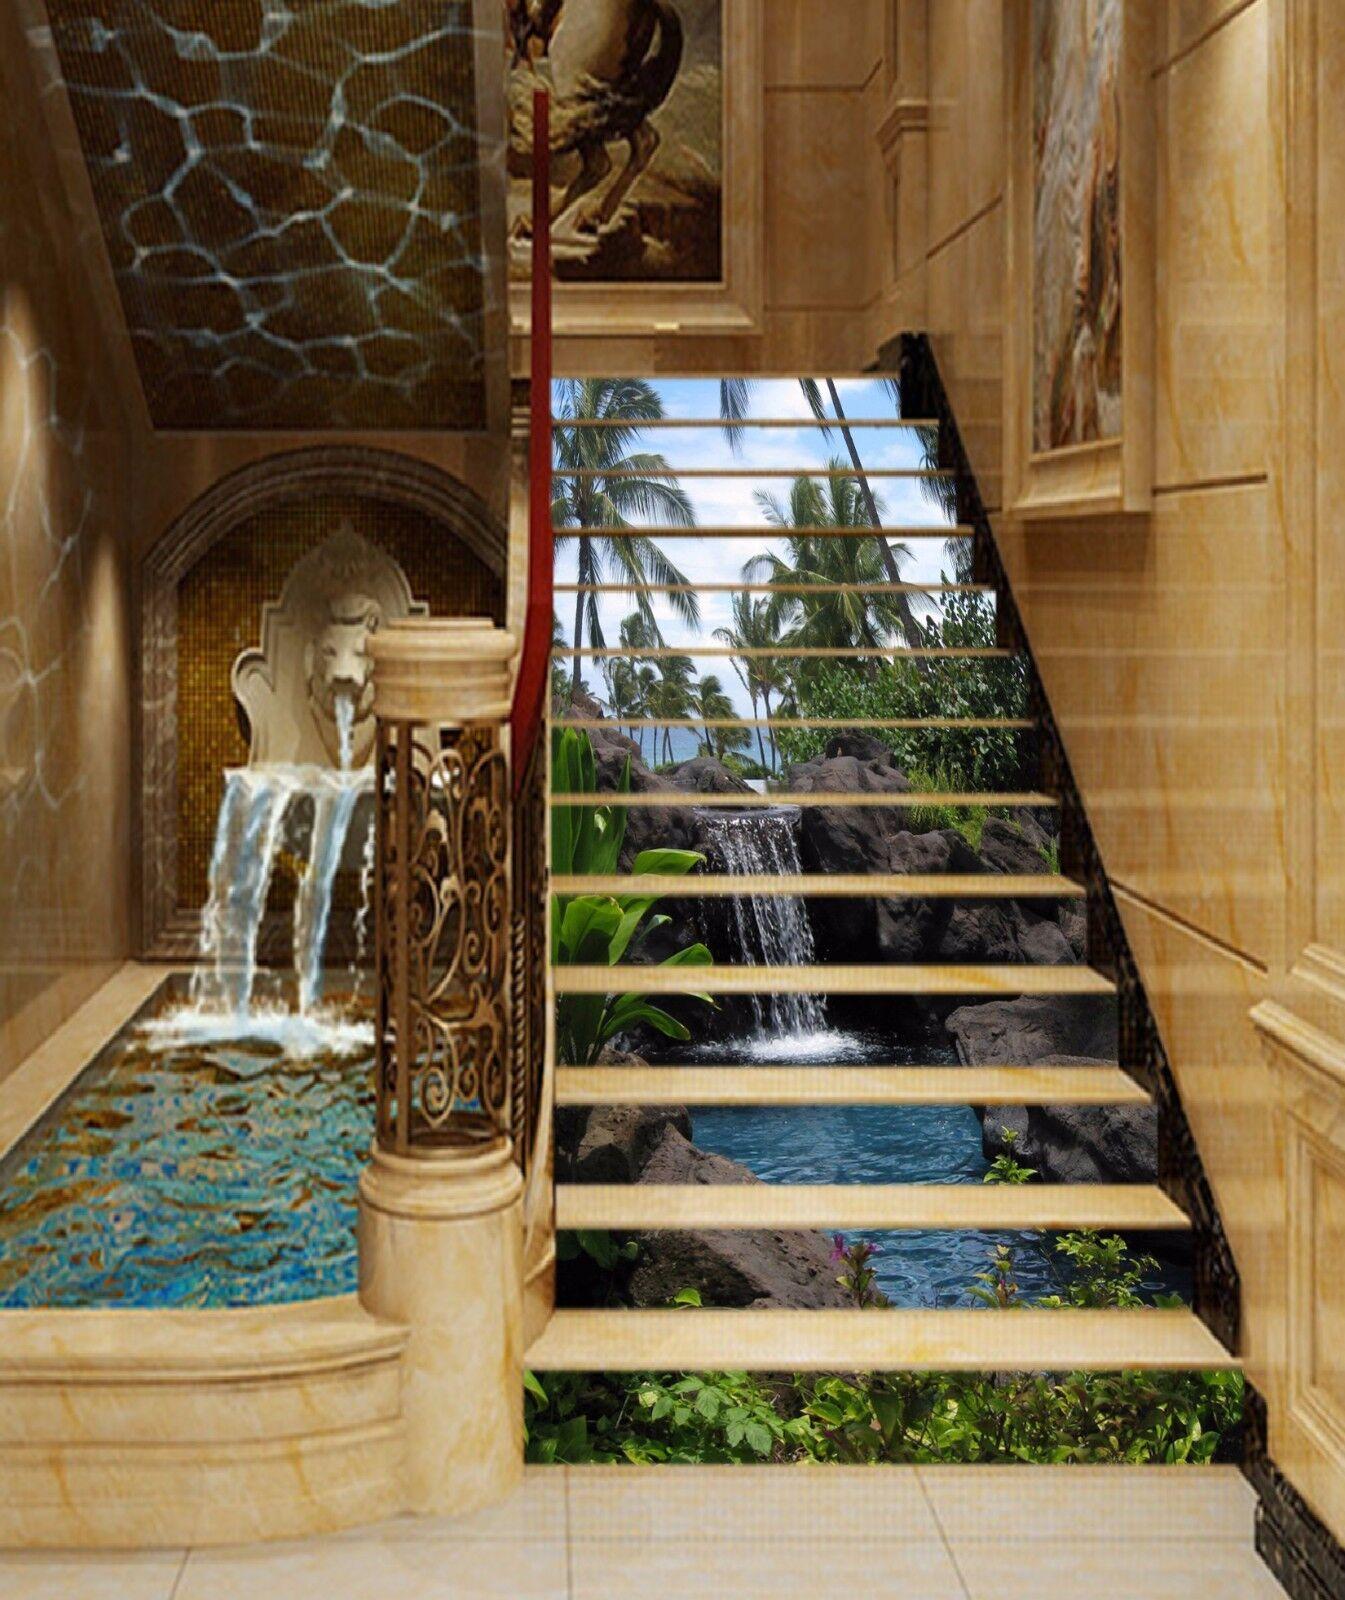 3D Tree Pond 864 Stair Risers Decoration Photo Mural Vinyl Decal Wallpaper AU